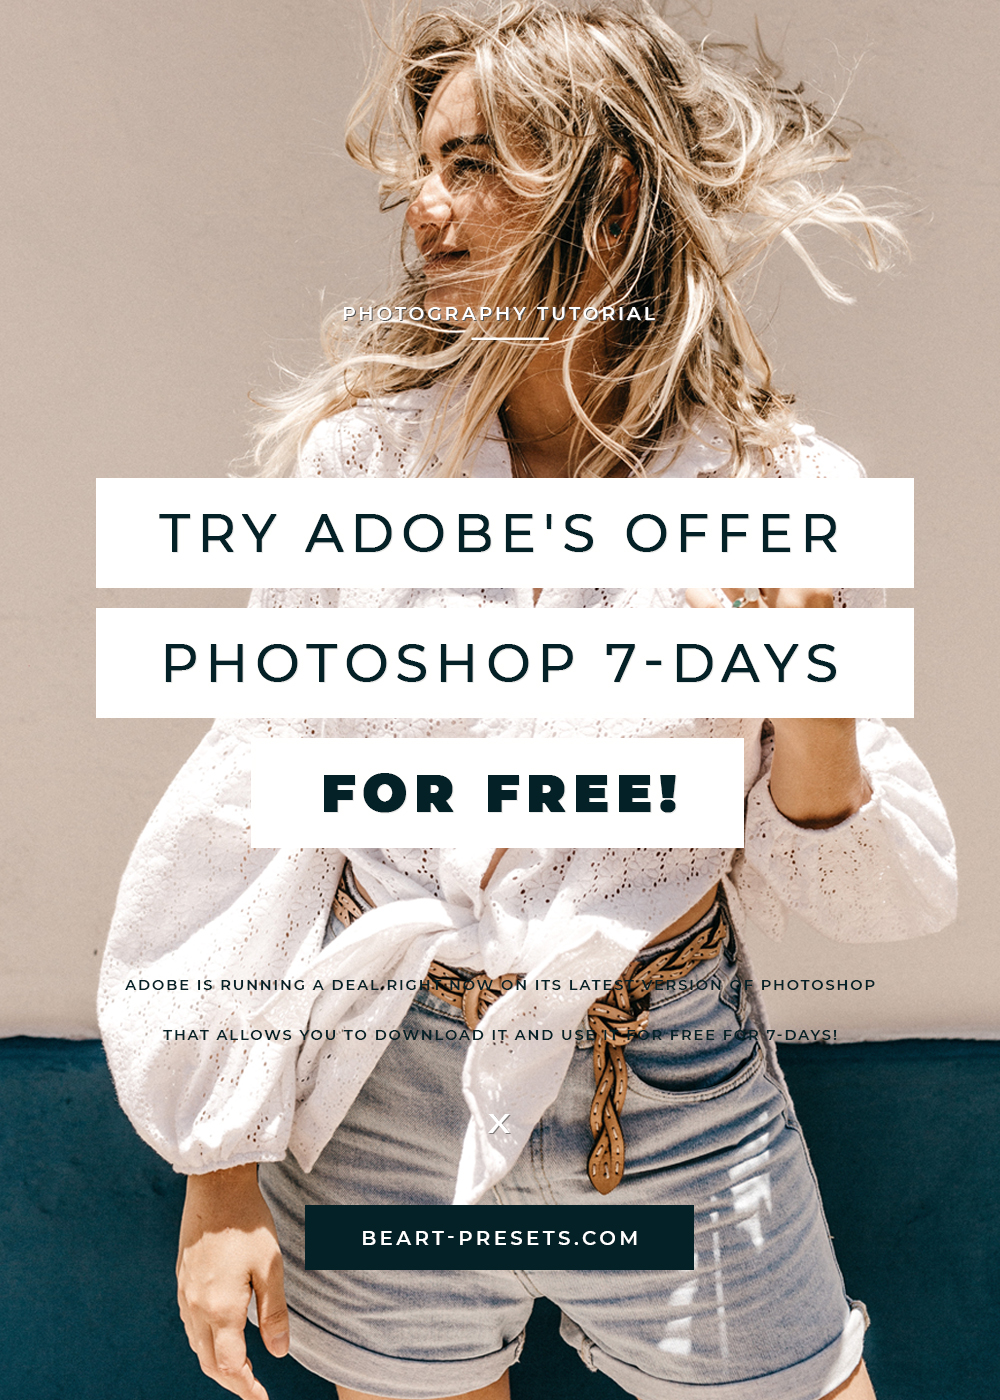 try adobe offer